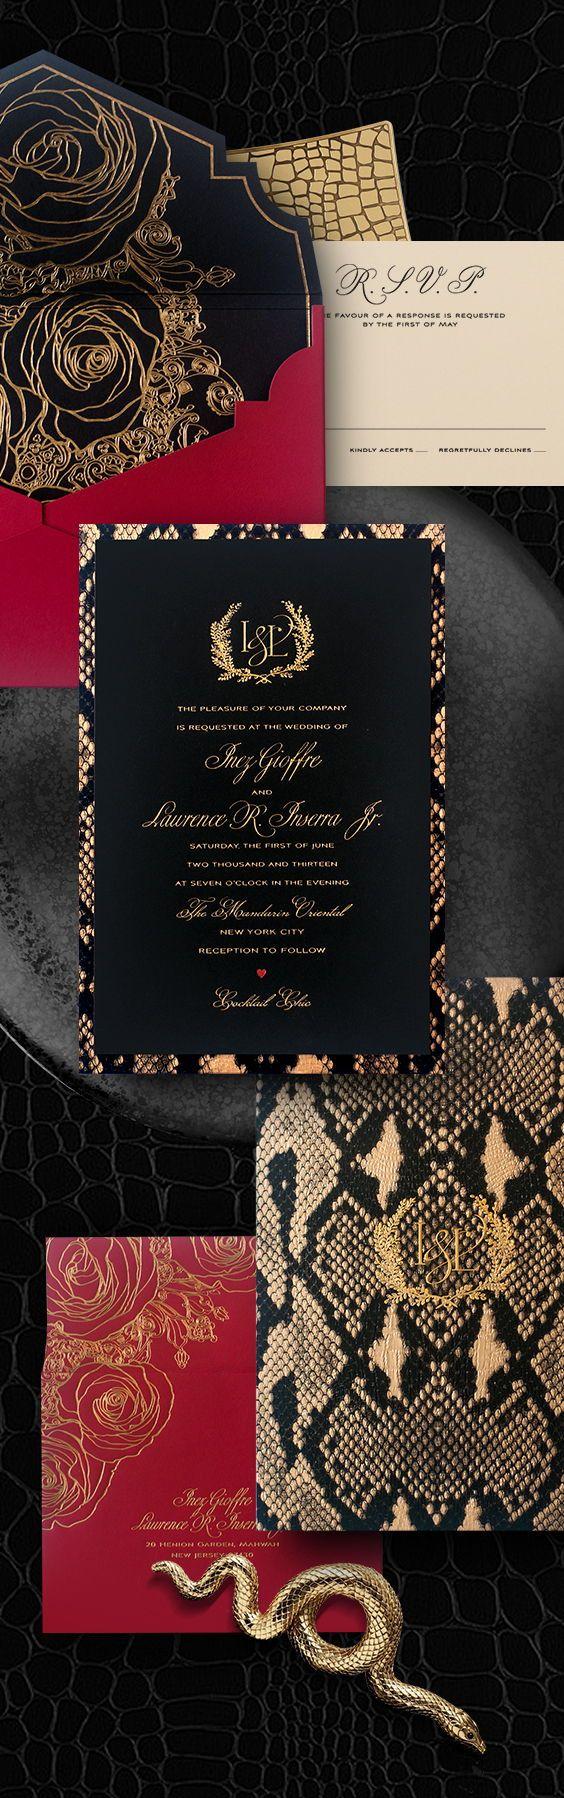 Fashion runway inspired modern wedding invitation with python ...